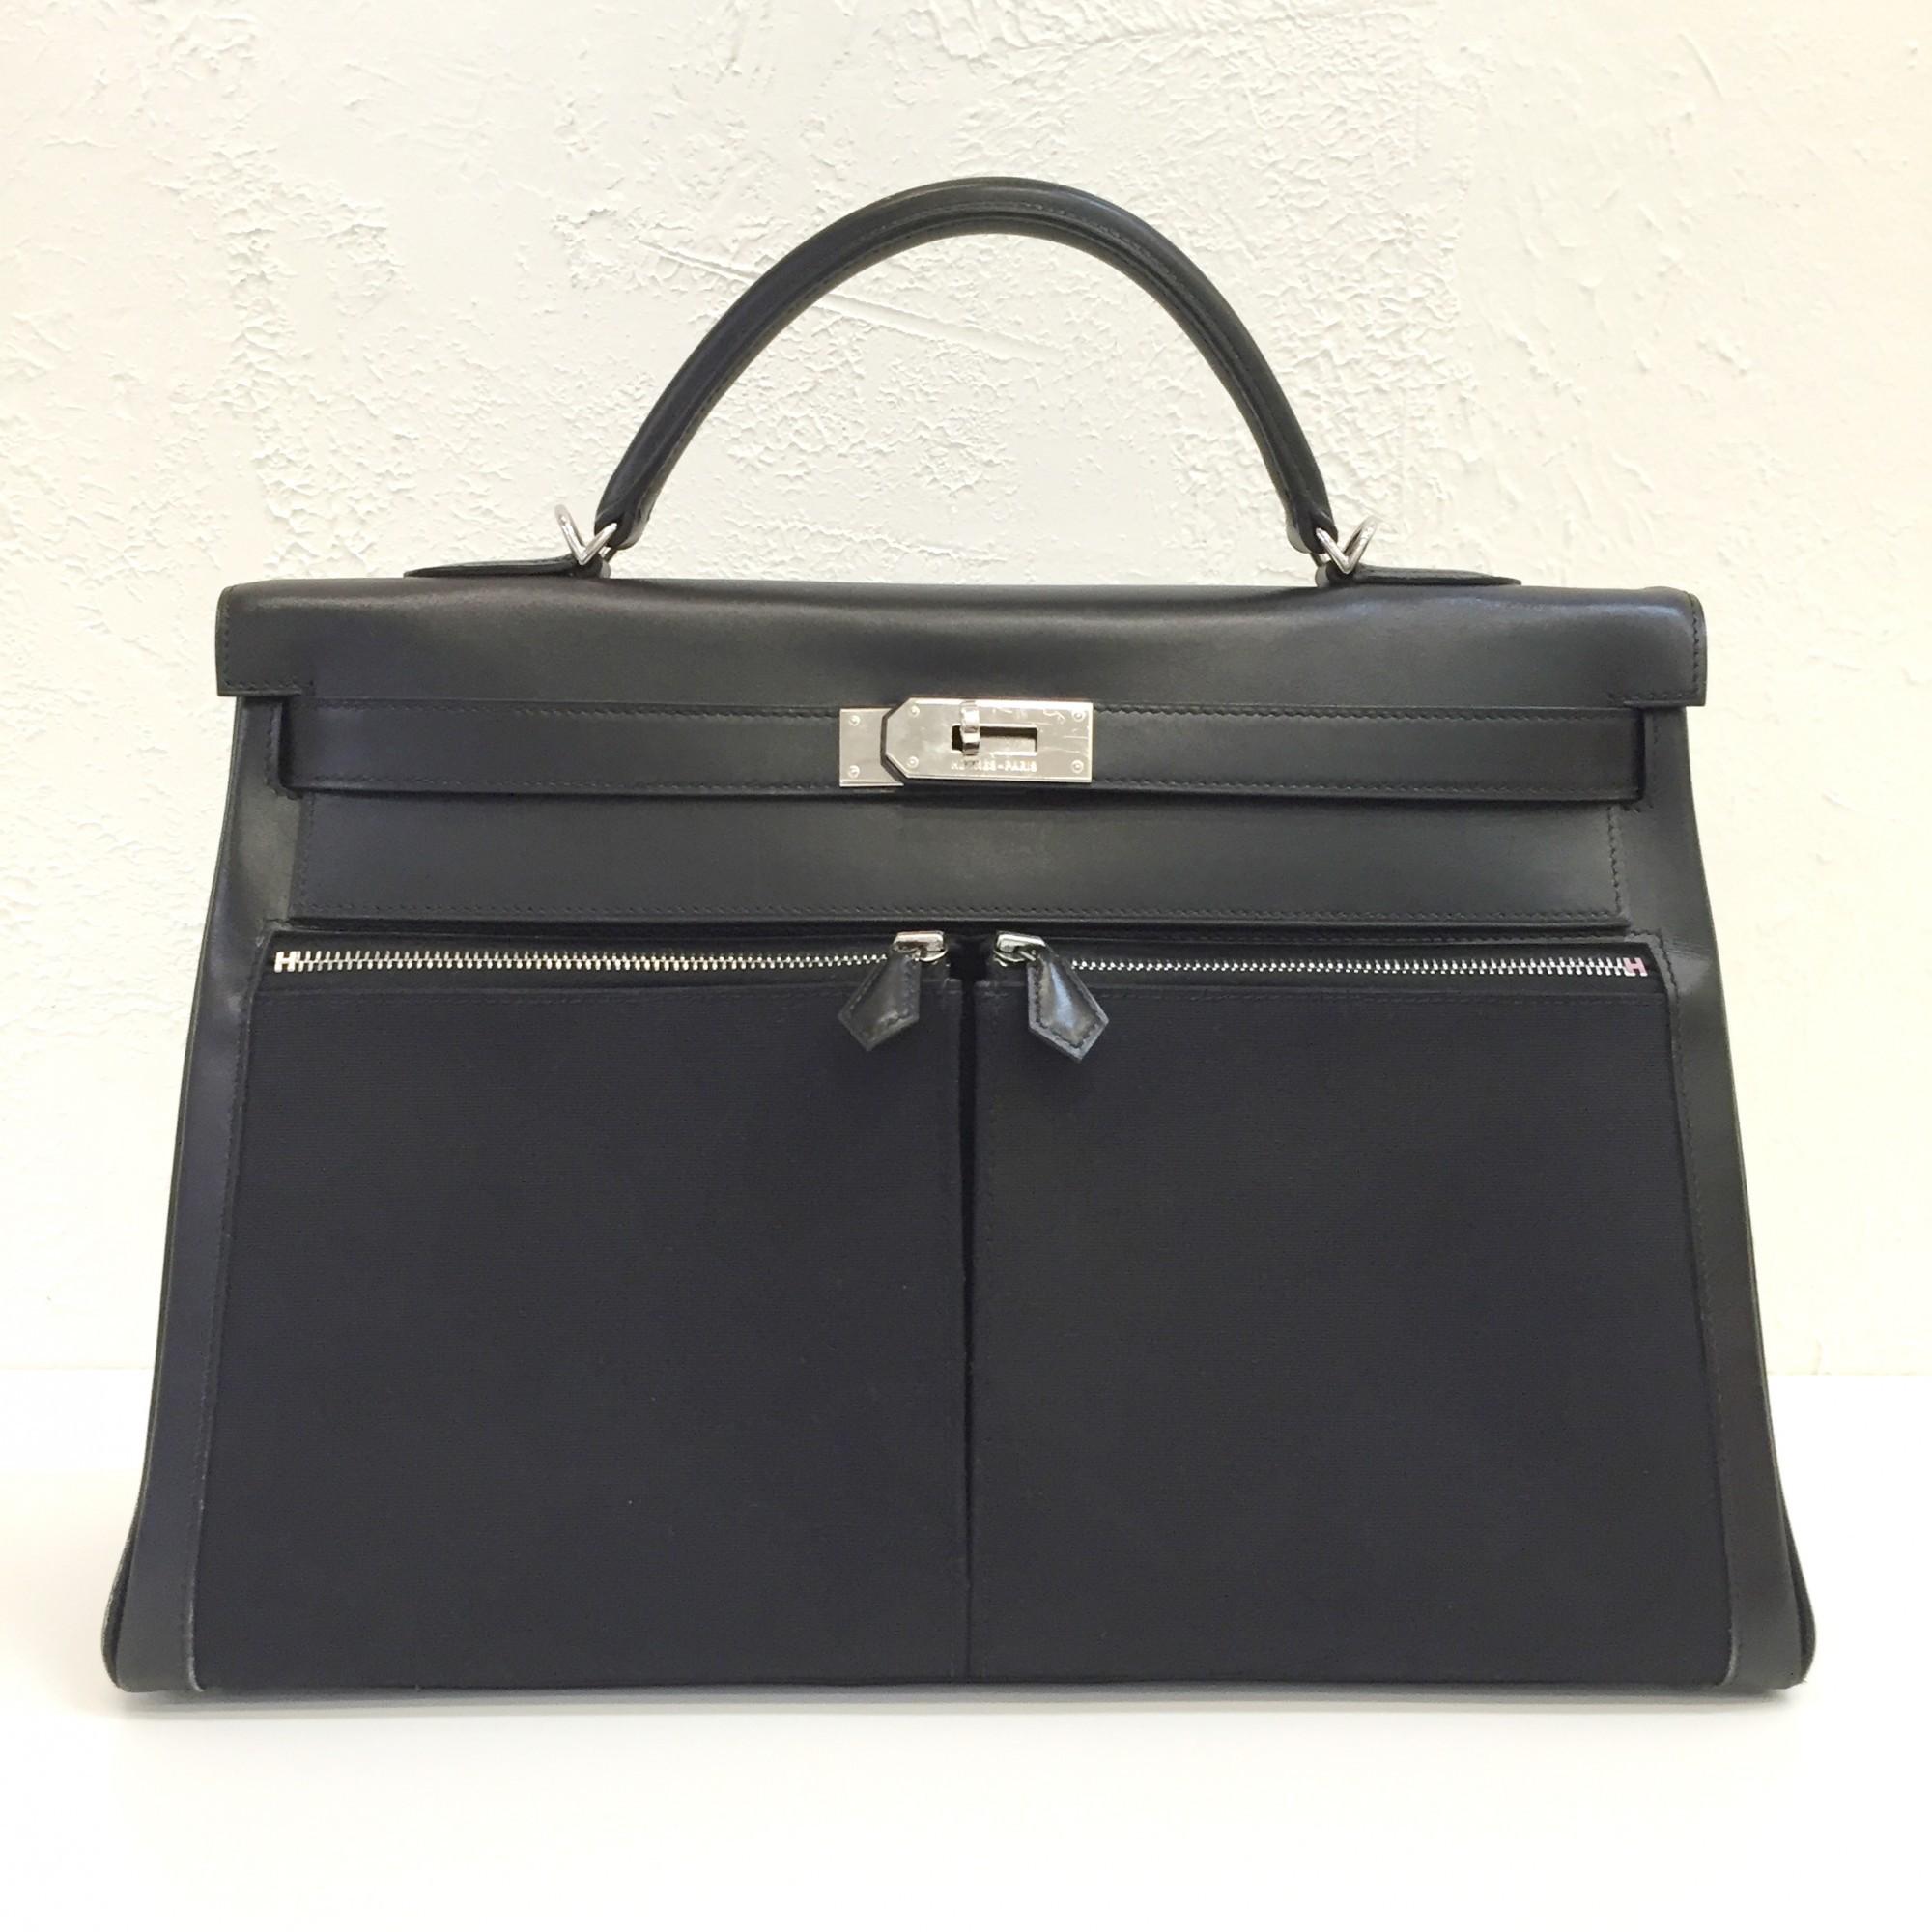 Buy Black Hermes Handbag At Lxr Amp Co